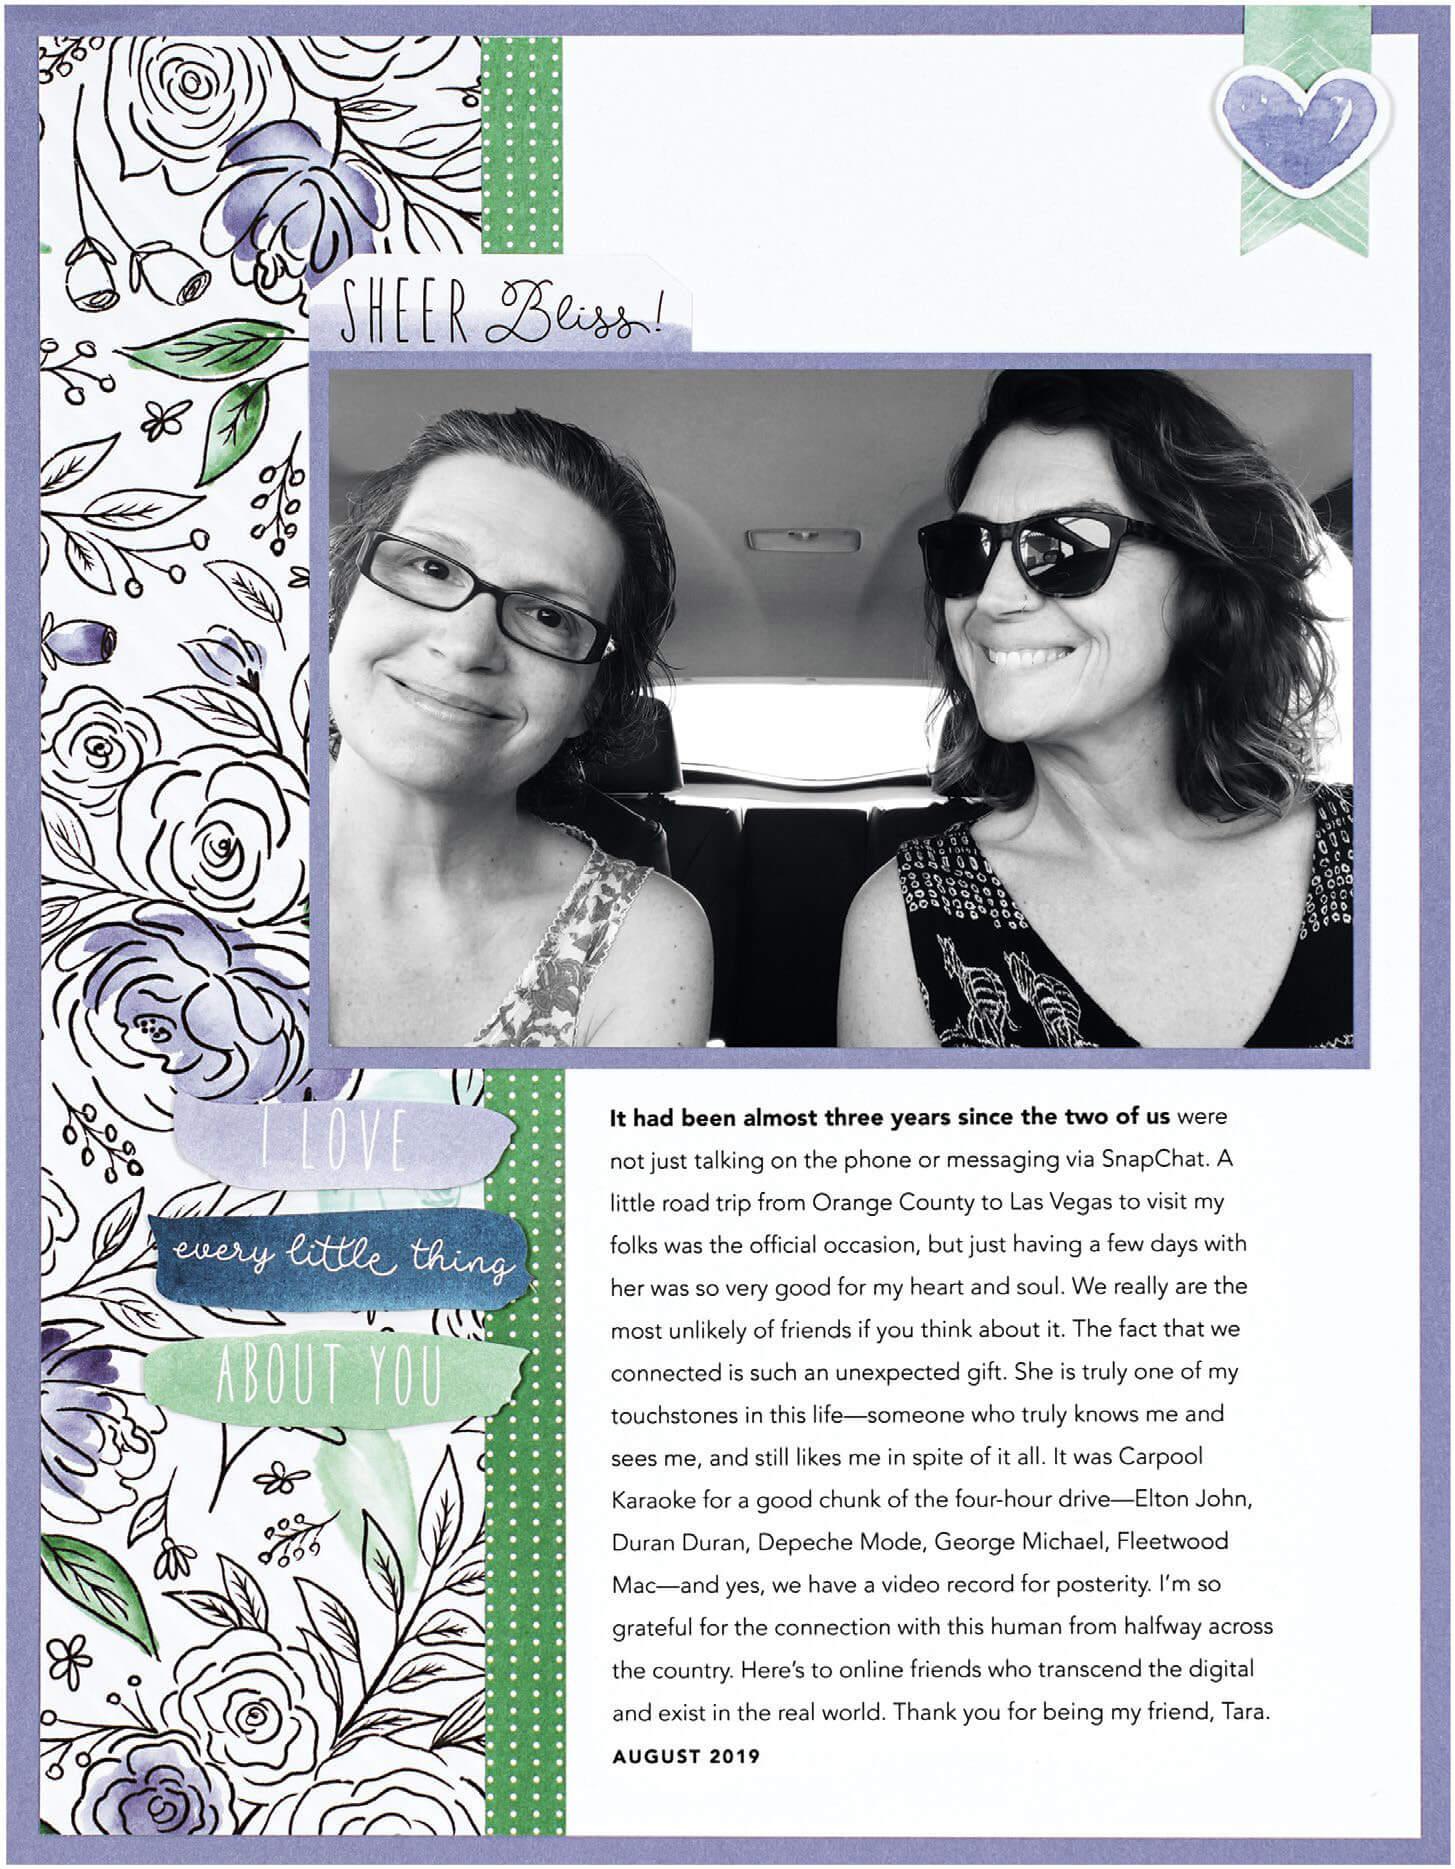 Scrapbook & Cards Today - Winter 2019 - Sheer Bliss layout by Cathy Zielske